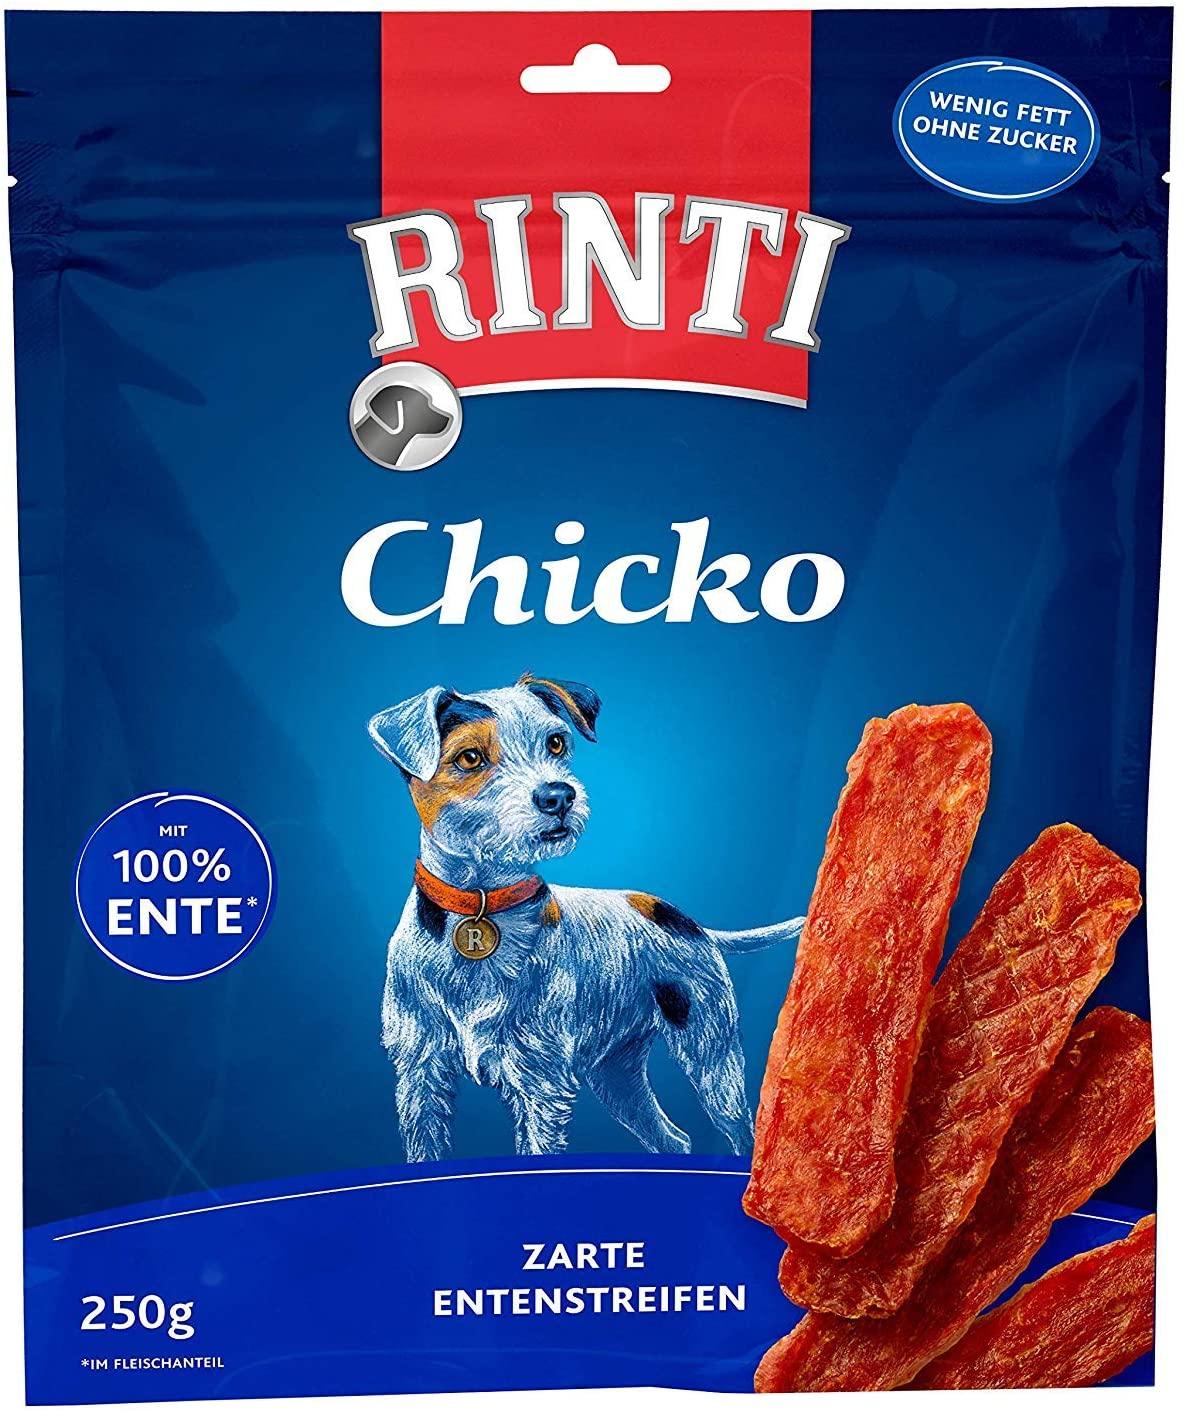 Rinti Chicko golosinas de pato para perros - PACK DE 3 (3x250g)